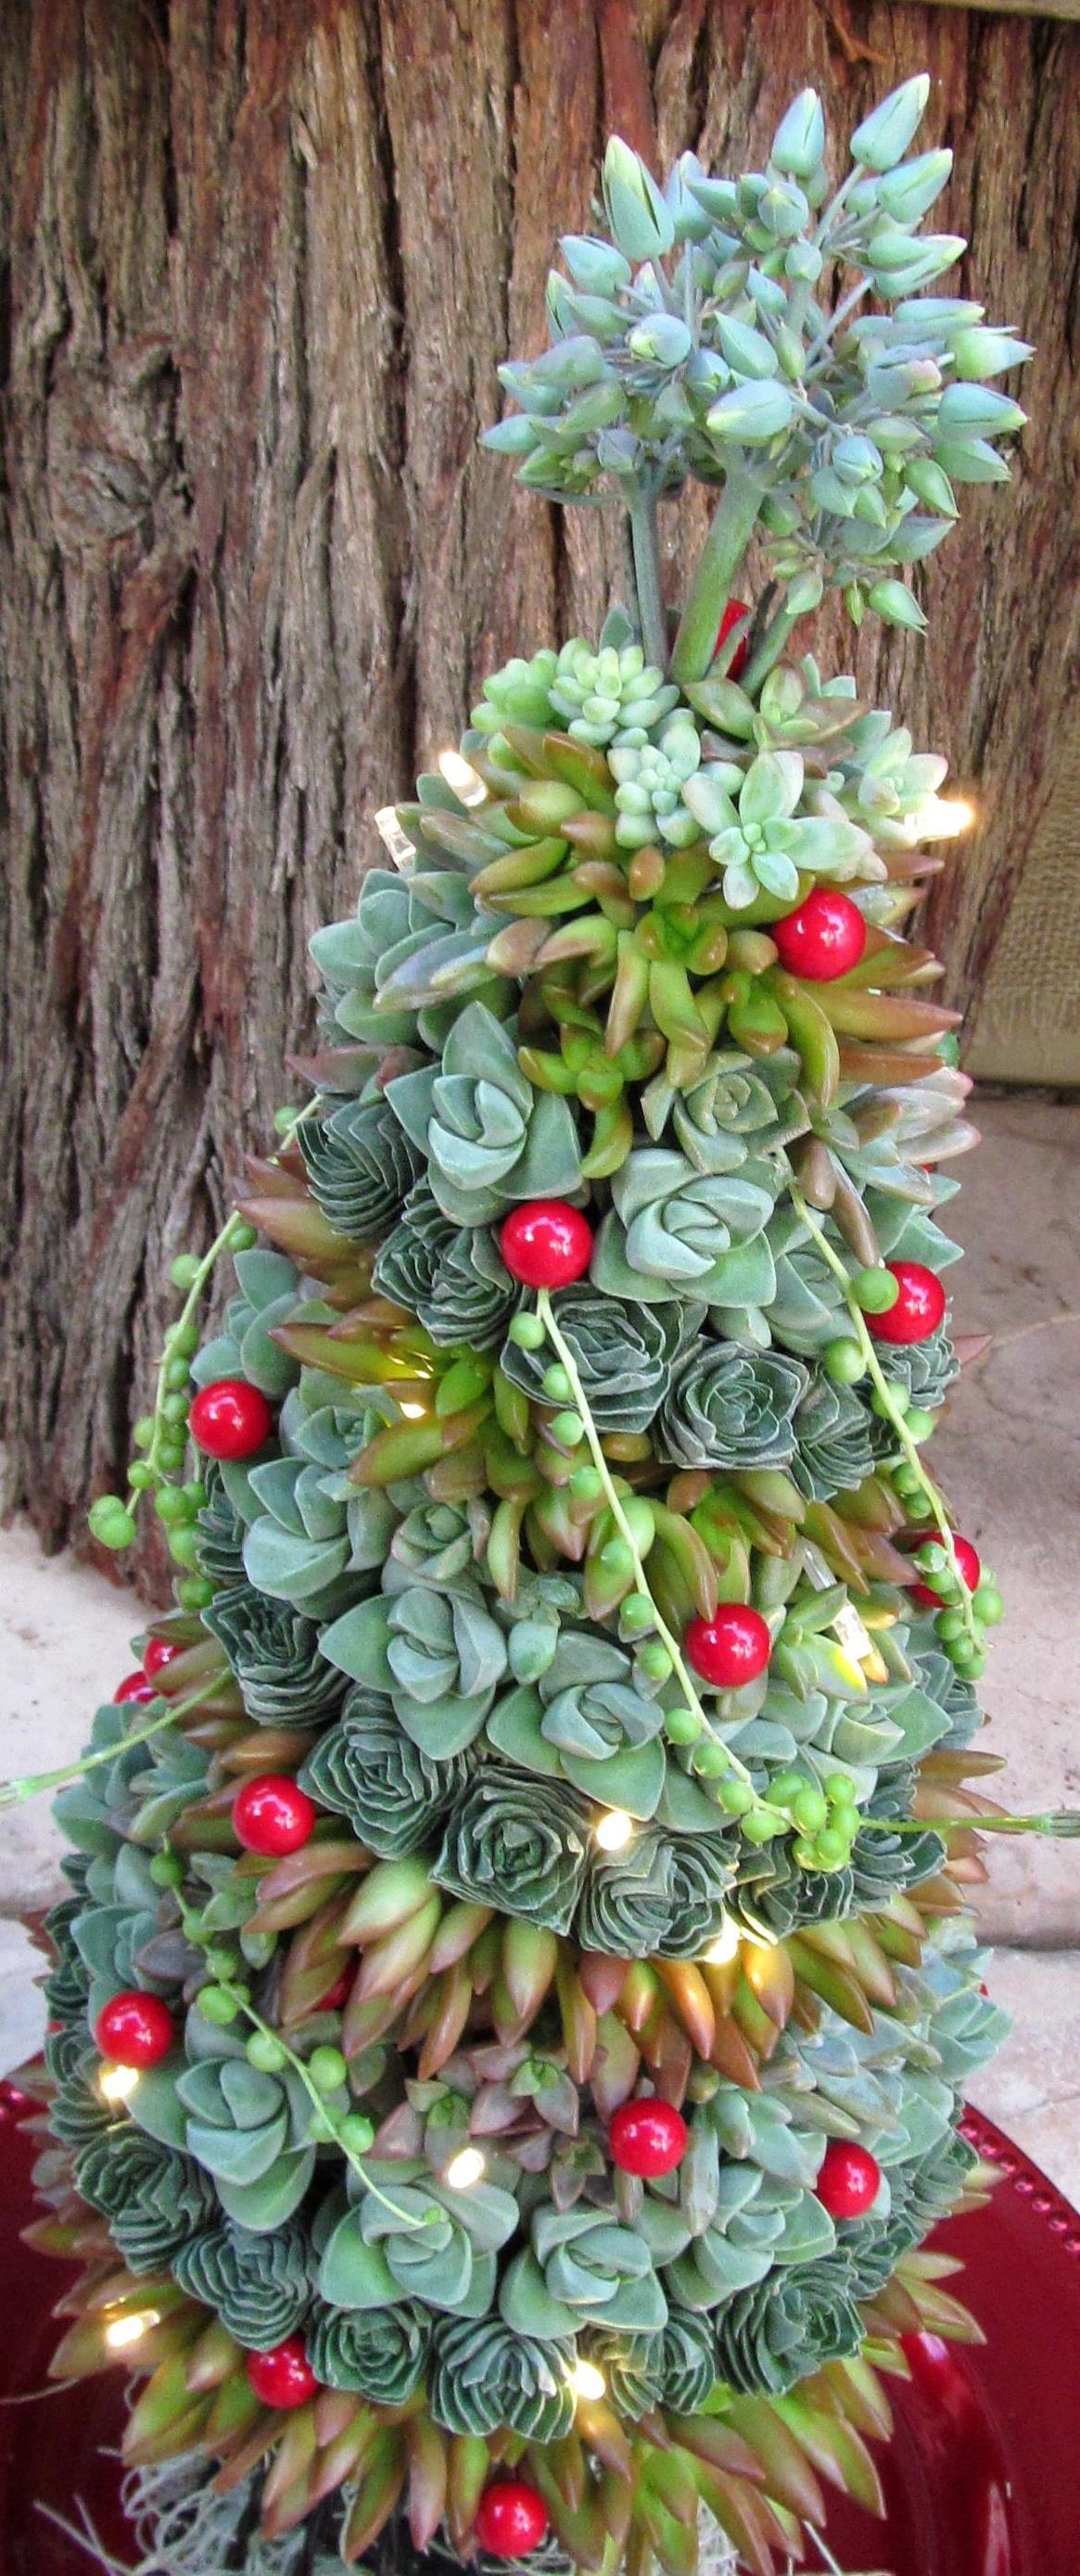 best images about suculentas on pinterest indoor succulent